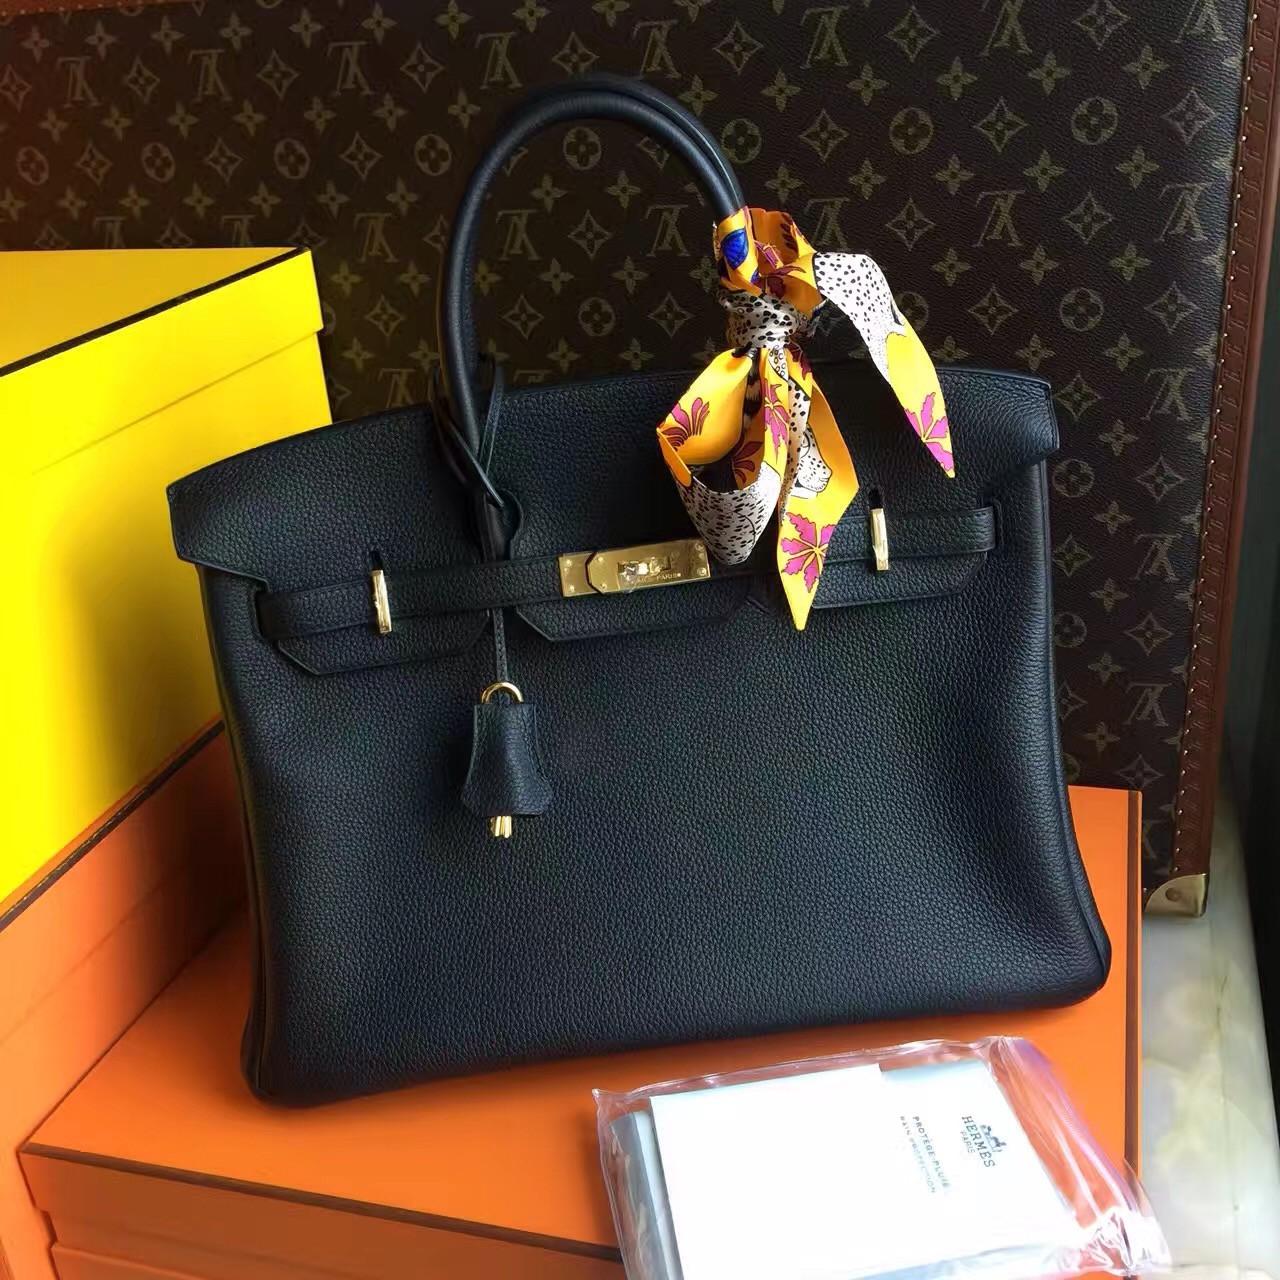 c223c9eec4 Hermès Birkin 35 cm Togo Leather Gold Hardware - Bella Vita Moda